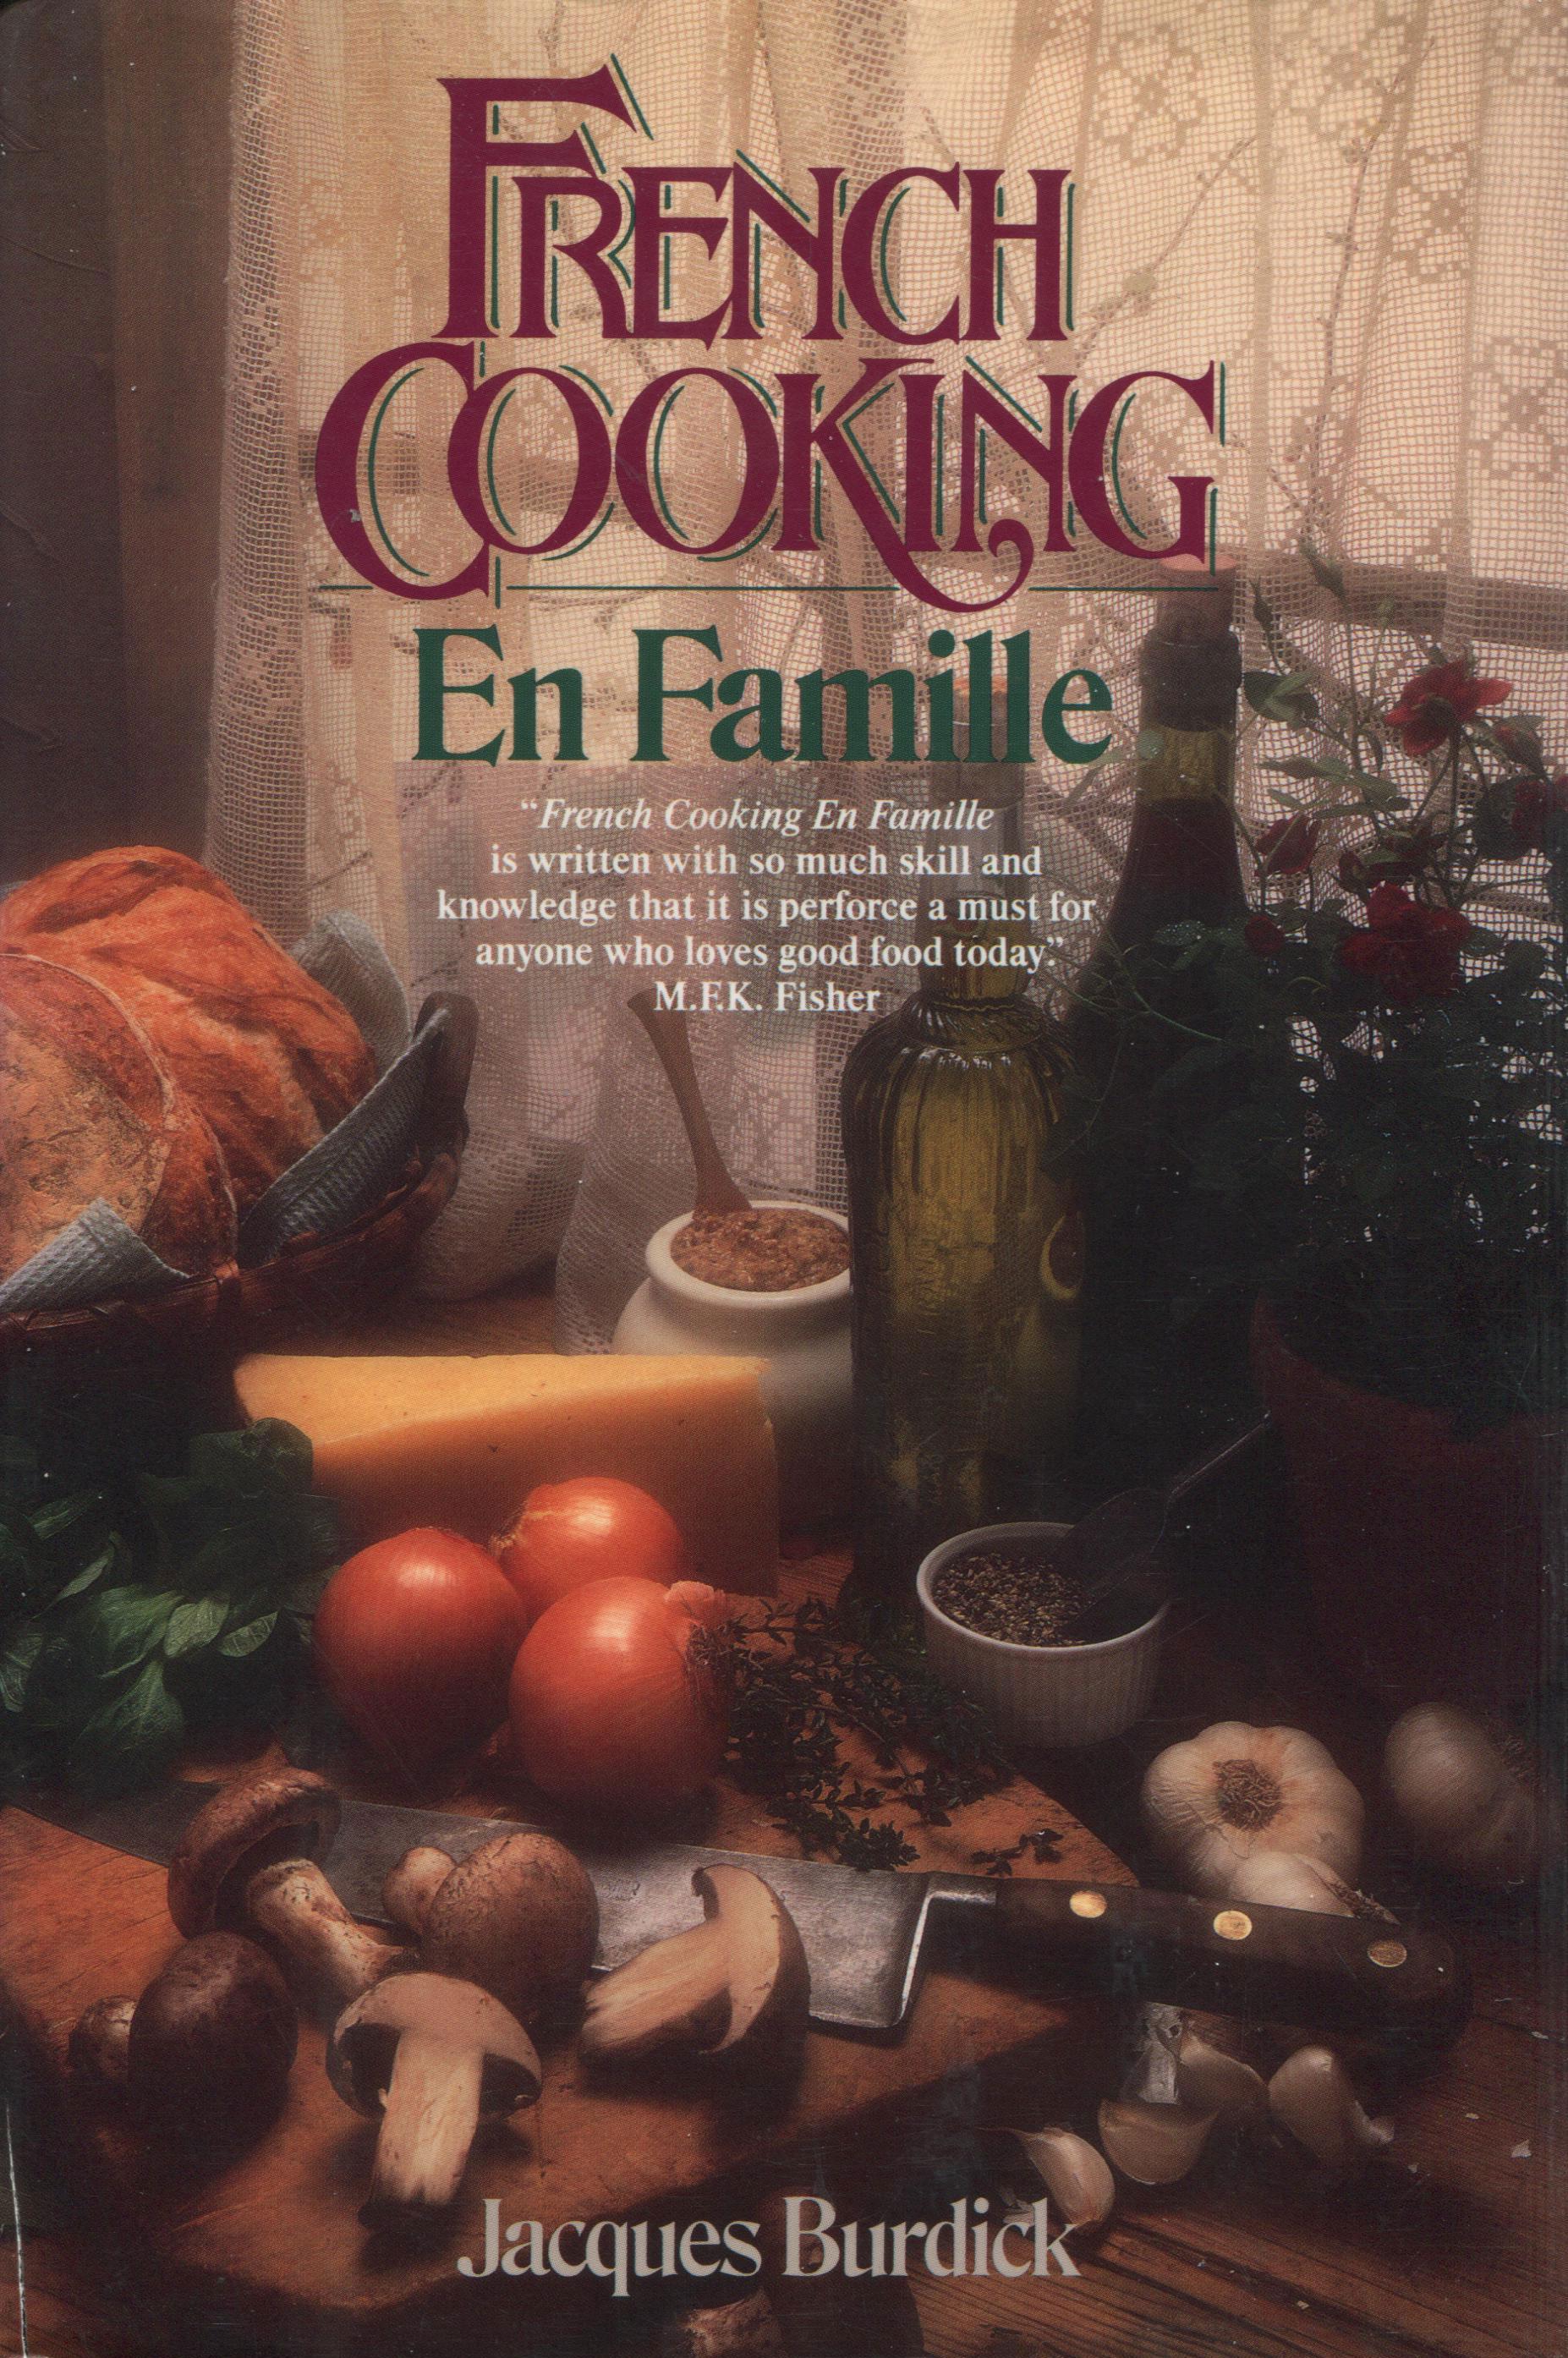 TBT Cookbook Review